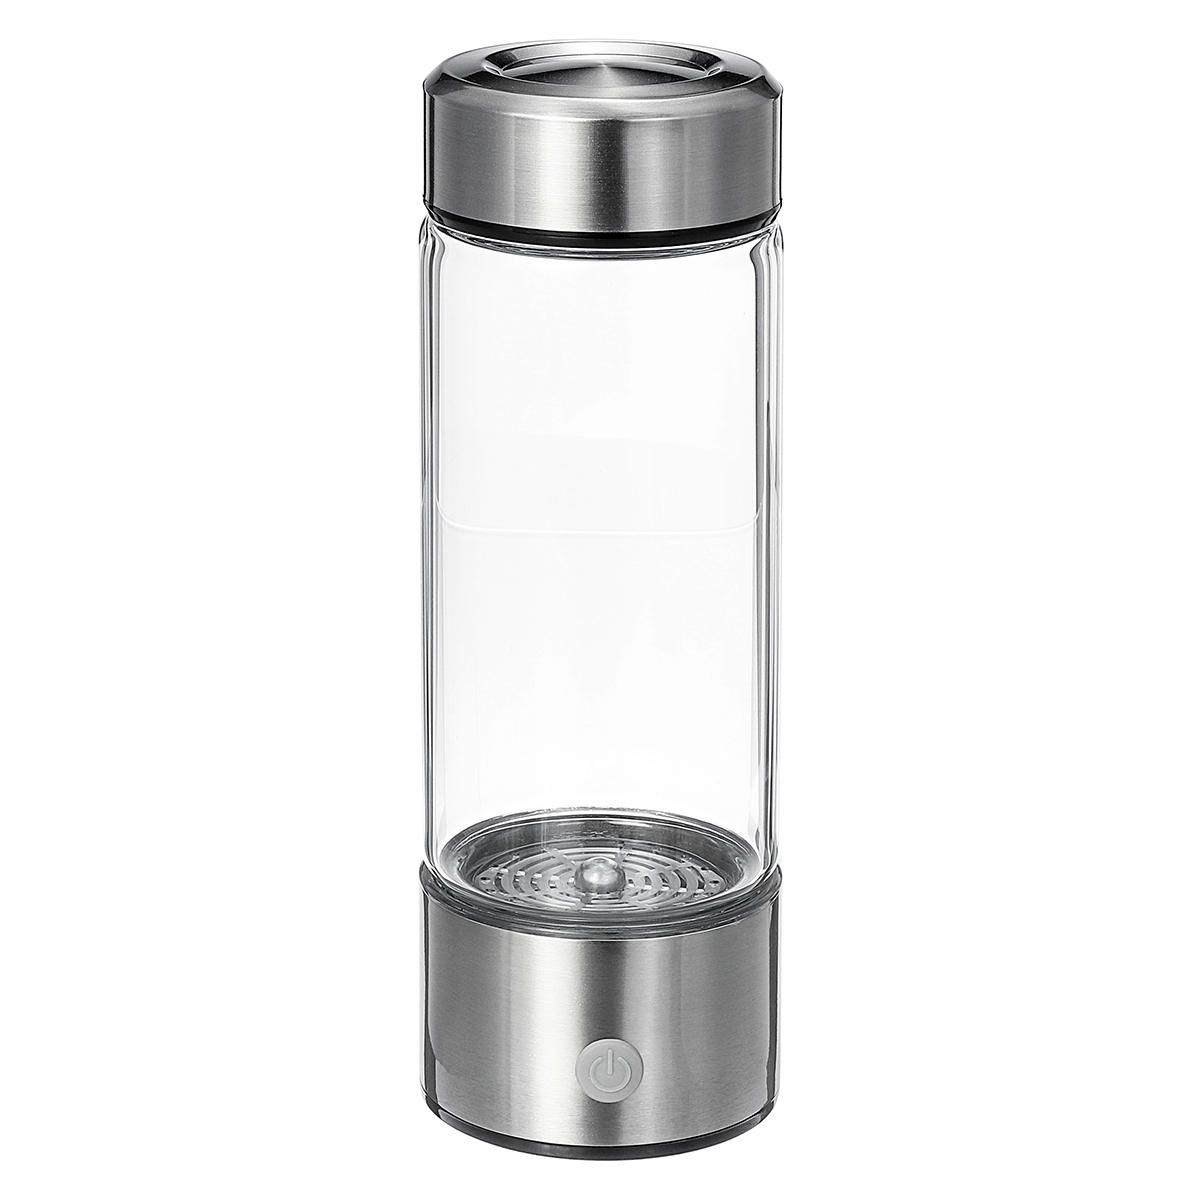 HXJ US$29.99 IPRee® 420ml Titanium Hydrogen-Rich Water Bottle USB Ionizer Antioxidants Maker Drining Cup